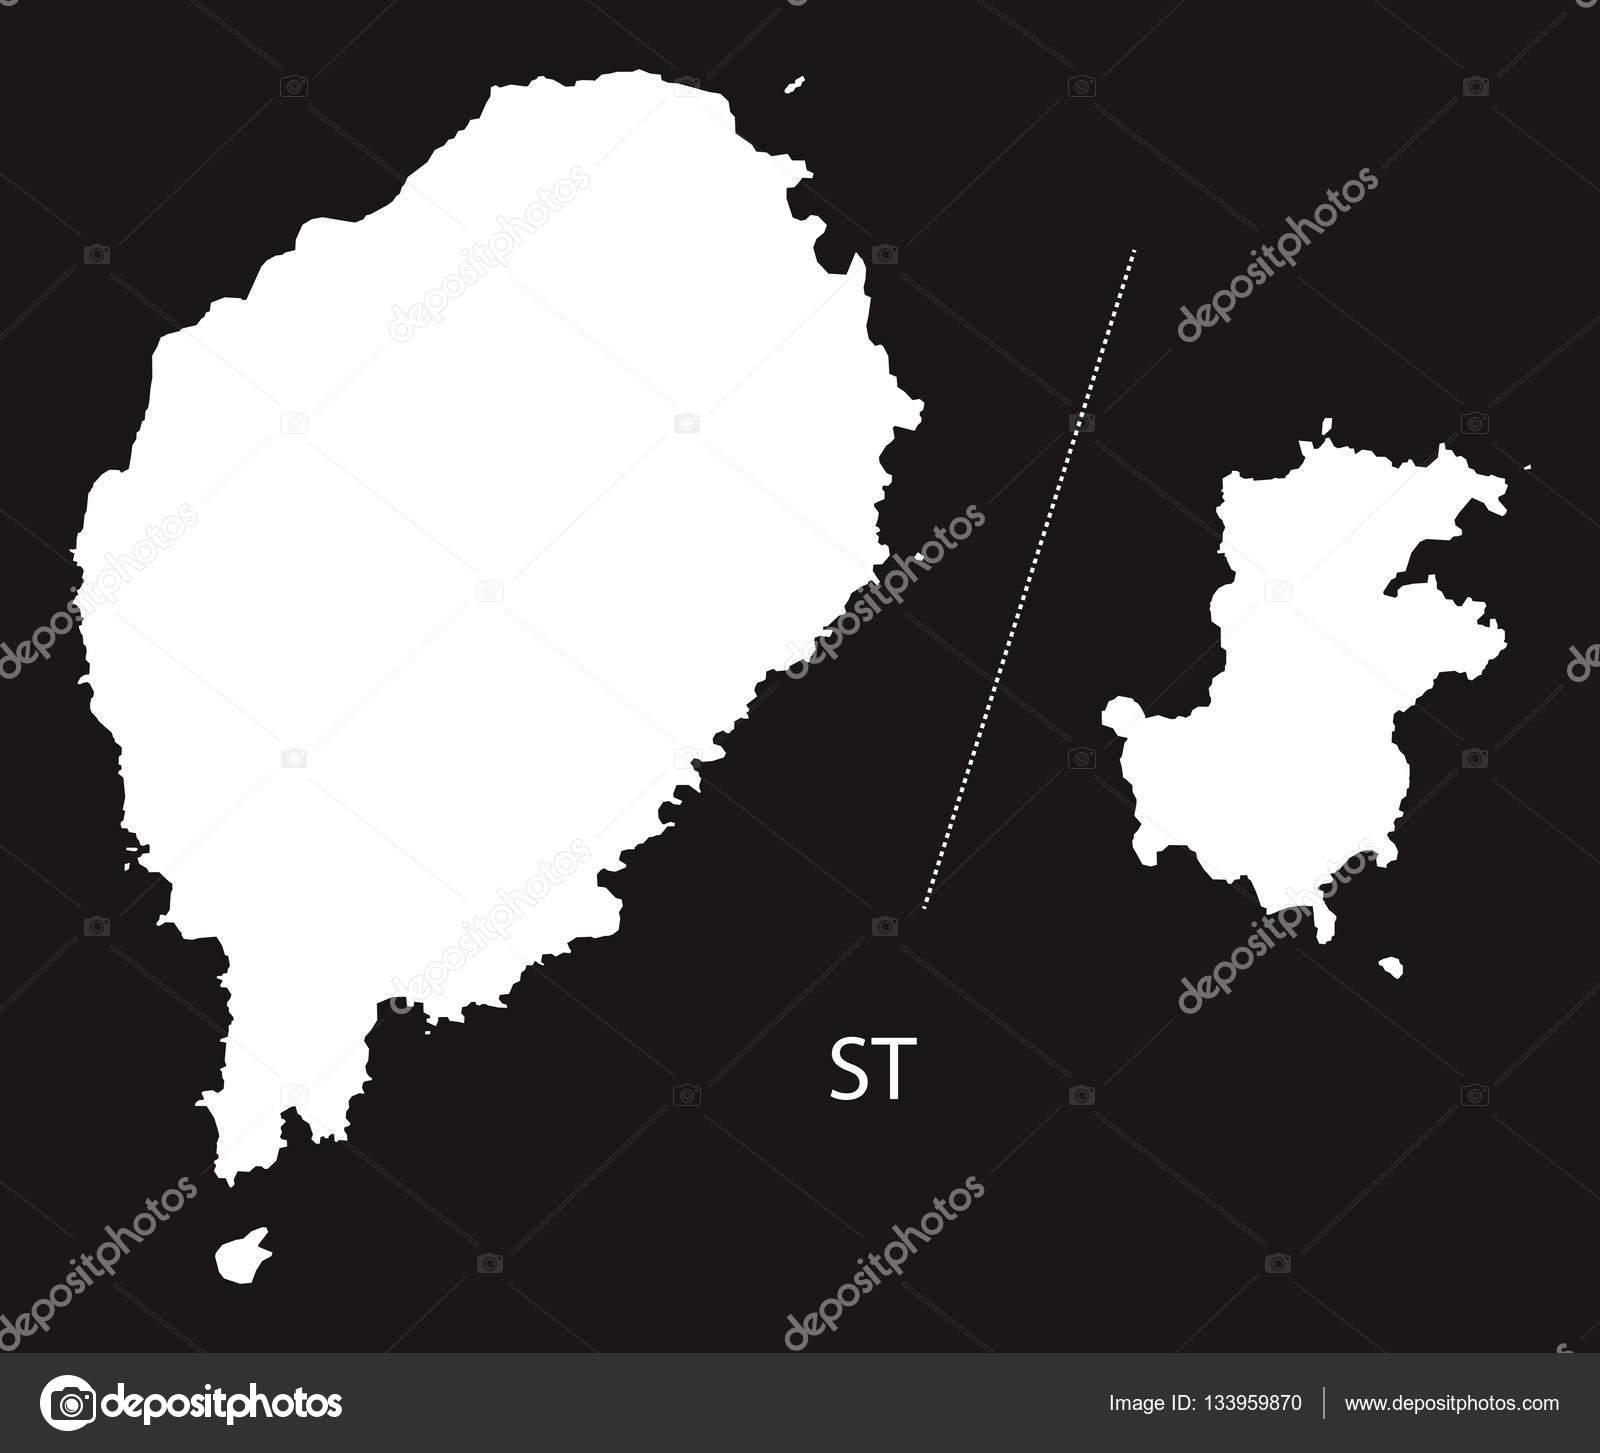 Sao Tome and Principe Map black and white — Stock Vector ... Sao Tome And Principe Map on nubian desert map, saudi arabia map, togo map, burkina faso map, mount kilimanjaro map, swaziland map, falkland islands malvinas map, sierra leone map, seychelles map, cape verde map, lake tanganyika map, mauritius map, senegal map, namibia map, cape of good hope map, rwanda map, kenya map, saint kitts and nevis map, atlas mountains map, djibouti map,